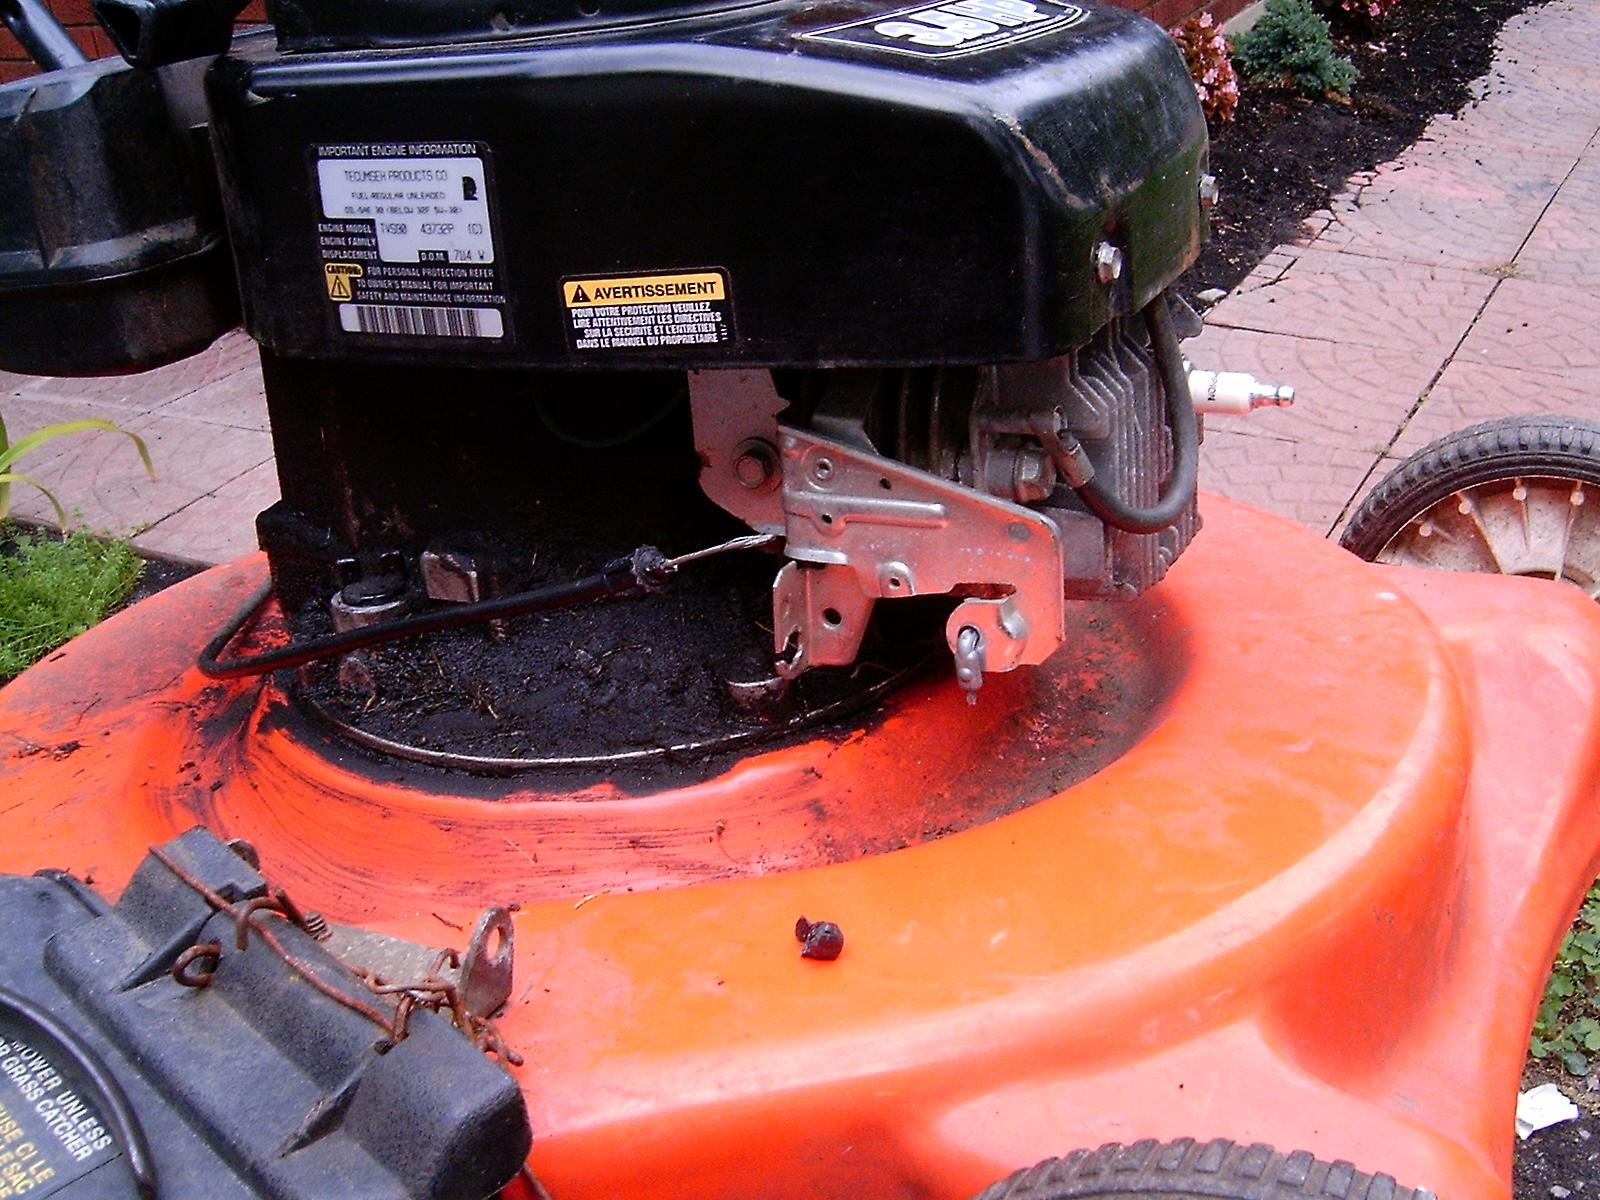 tecumseh c1128 3 5hp engine model tvs90 43732p c rh tecumsehc21128tvs9043732 blogspot com Tecumseh TVS90 Carburetor Diagram TVS90 Carburetor